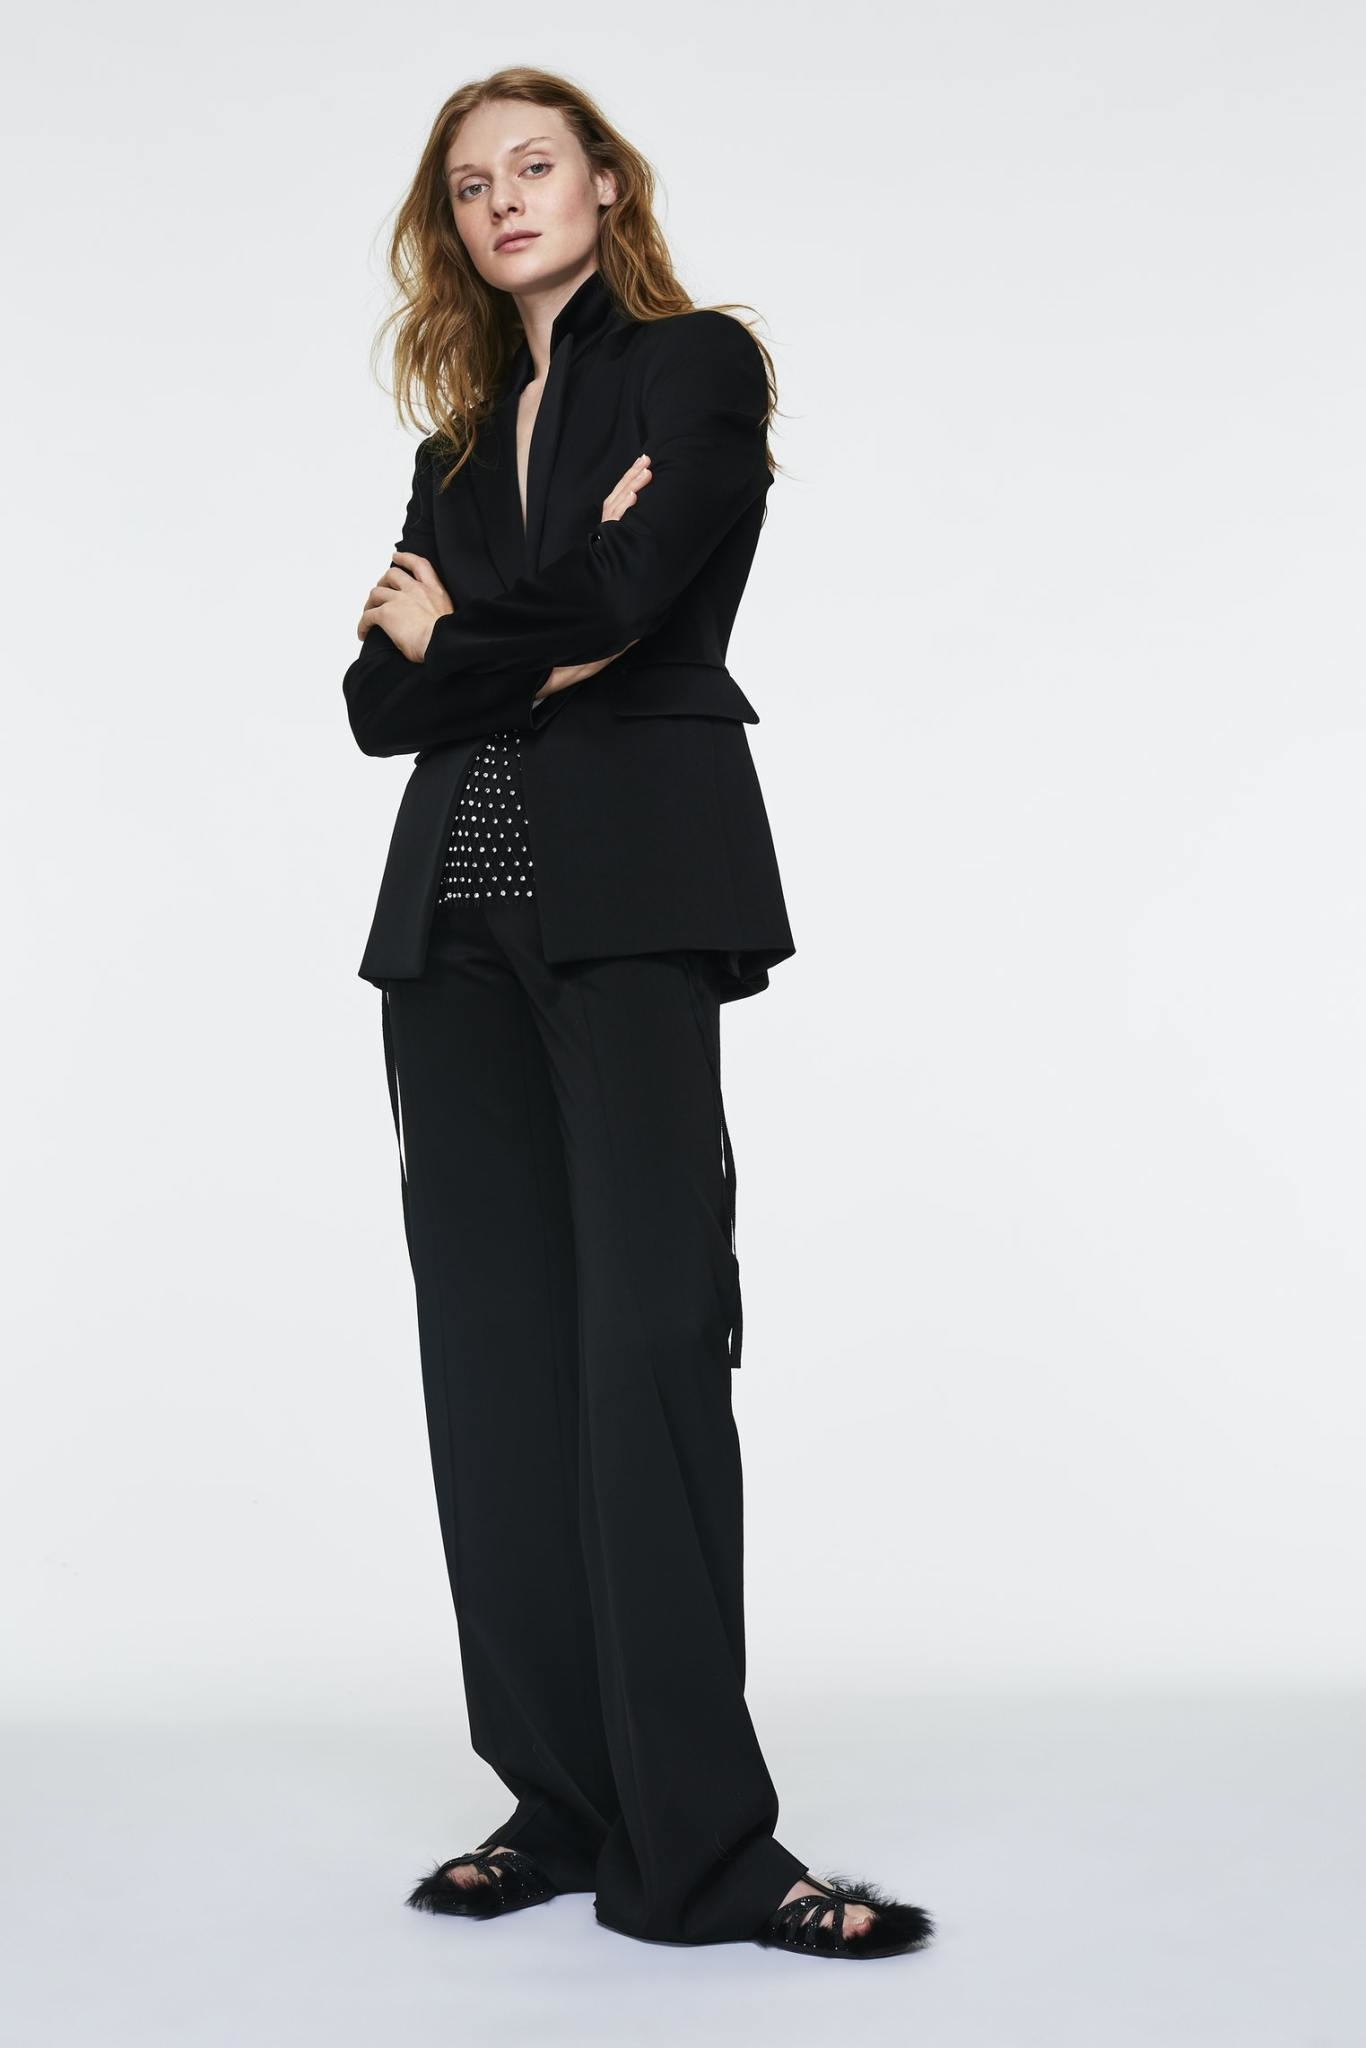 Classy statement pants dorothee schumacher-4